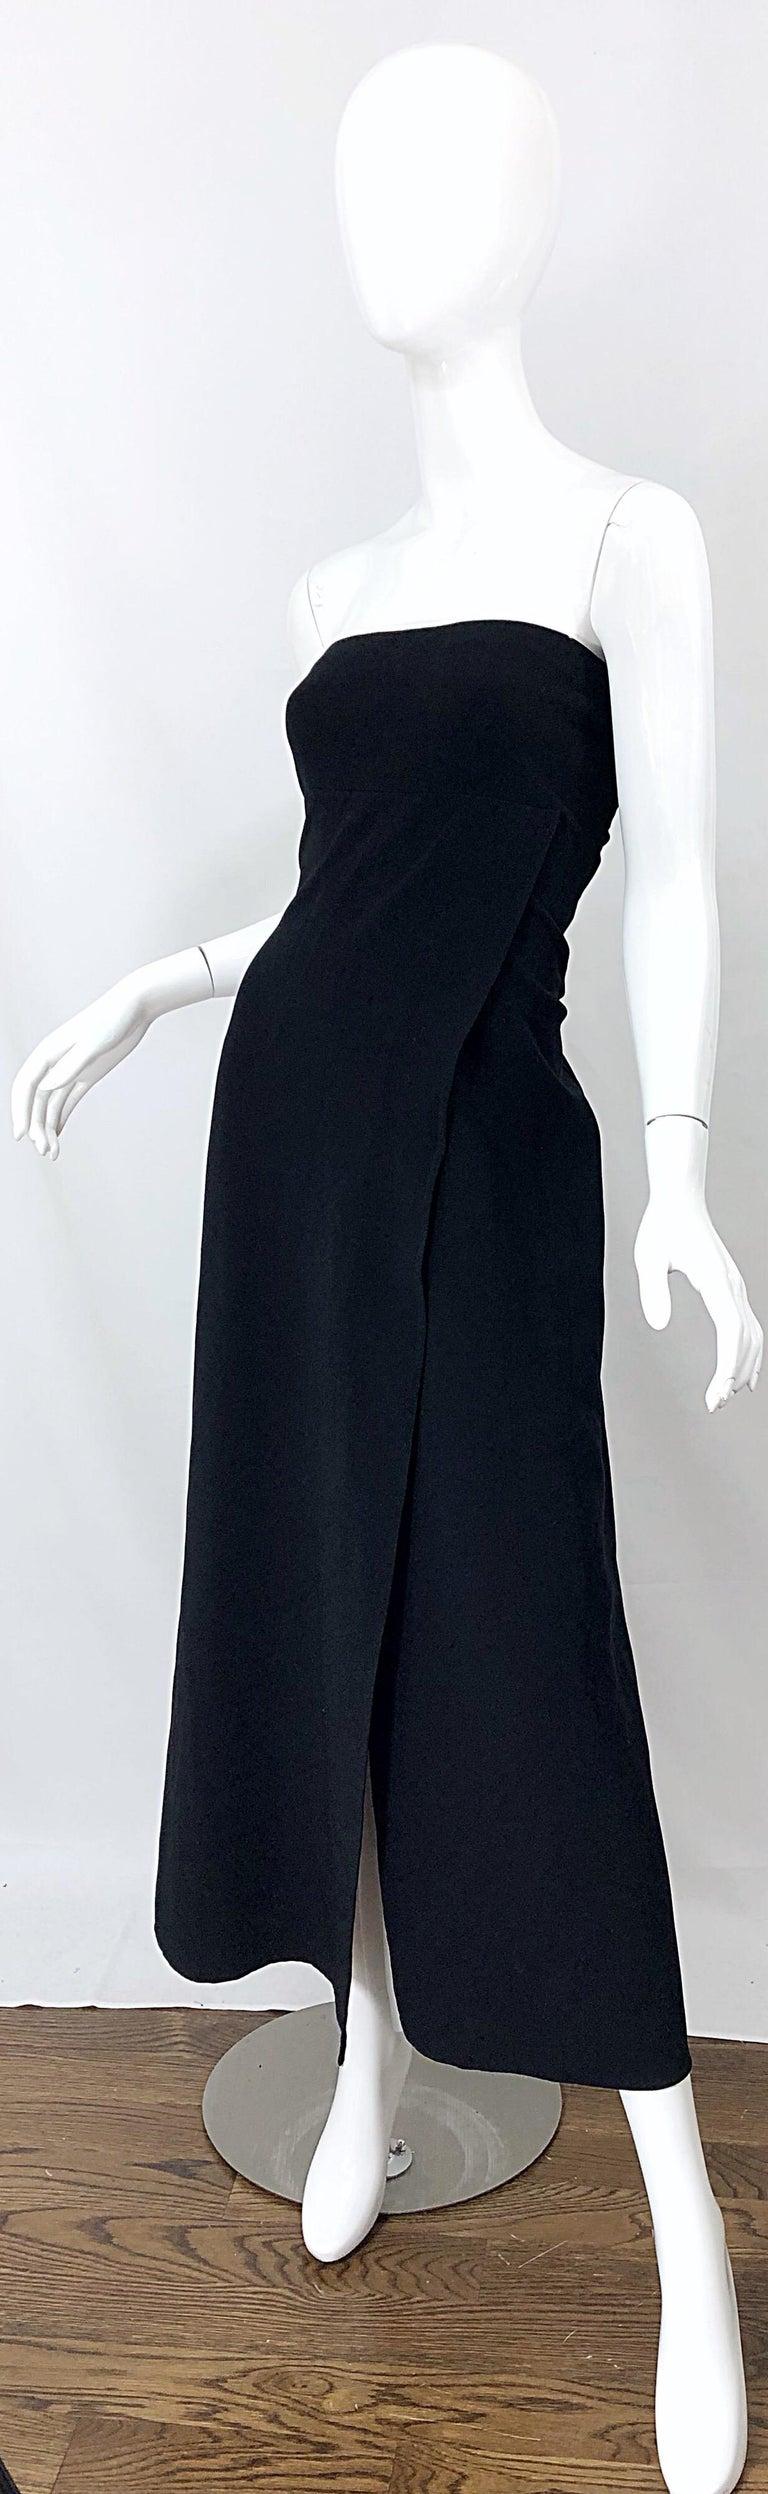 Women's 1990s Donna Karan New York Size 4 Black Strapless Vintage 90s Gown Maxi Dress For Sale